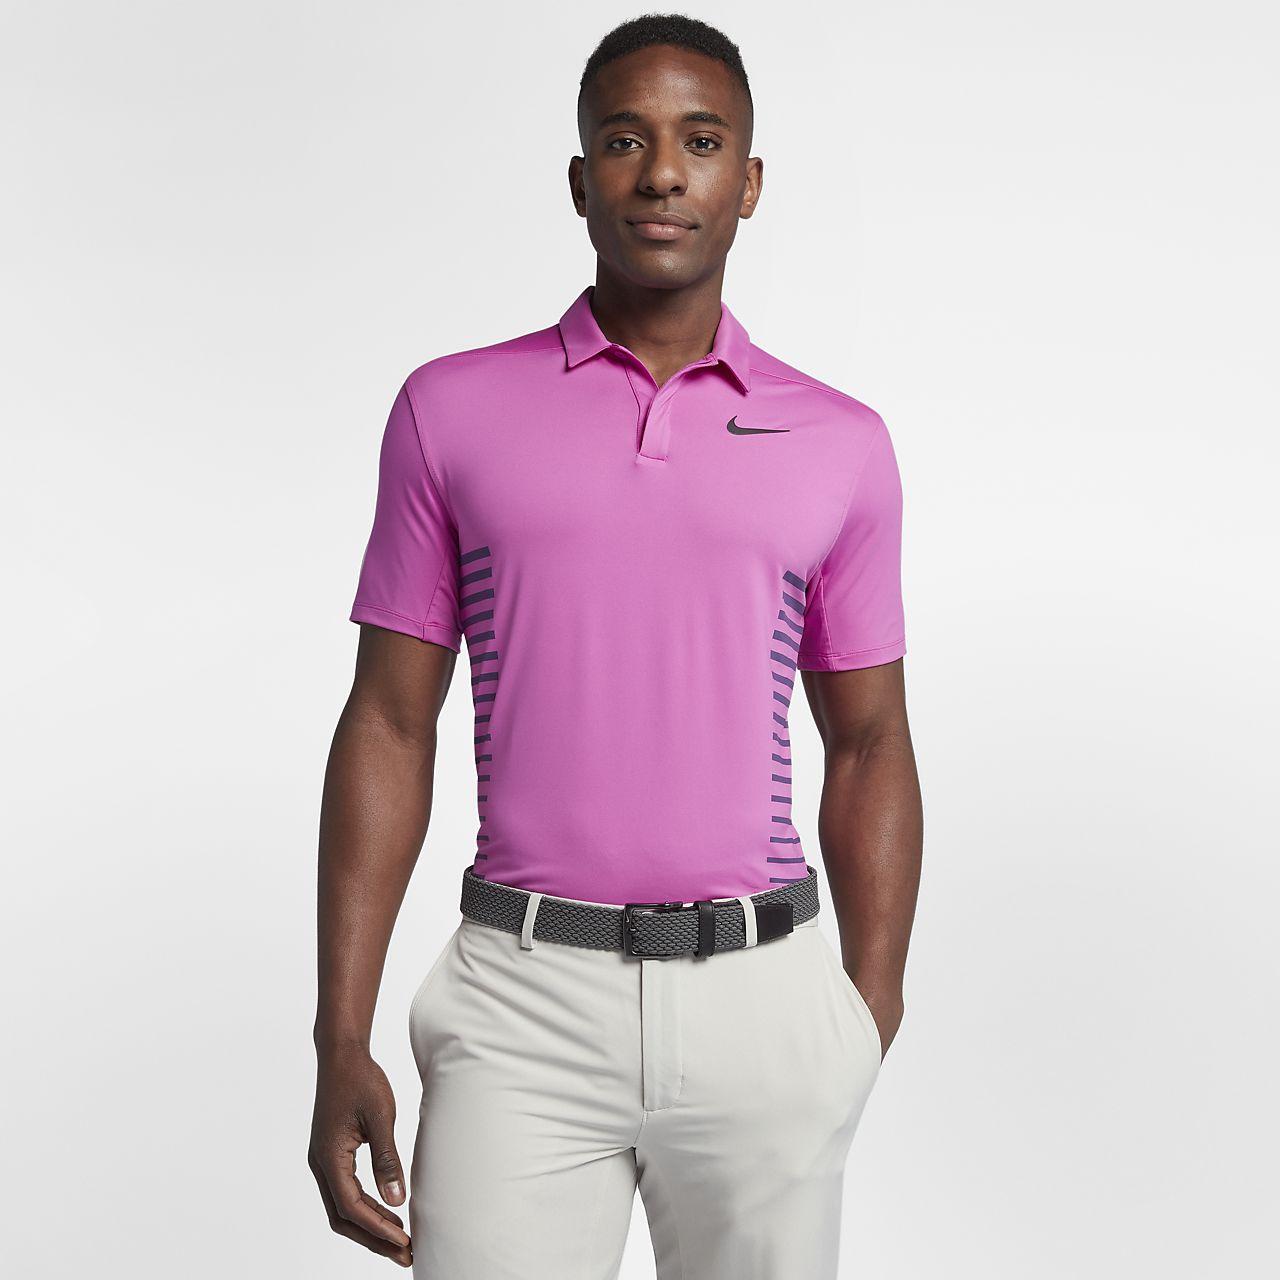 48a7f63e25 Mens Nike Dri Fit Collared Shirts